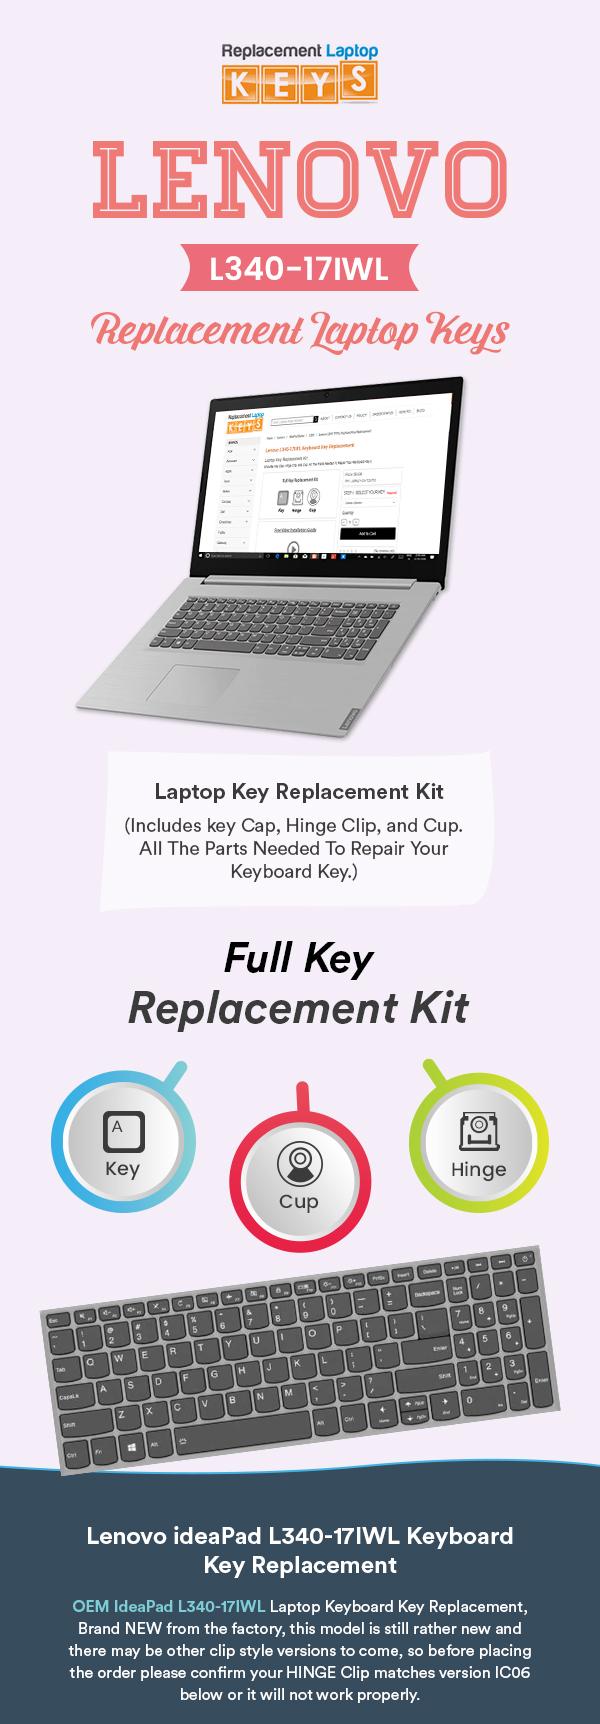 Get High Quality Lenovo L340-17iwl Keyboard keys form Replacement Laptop Keys